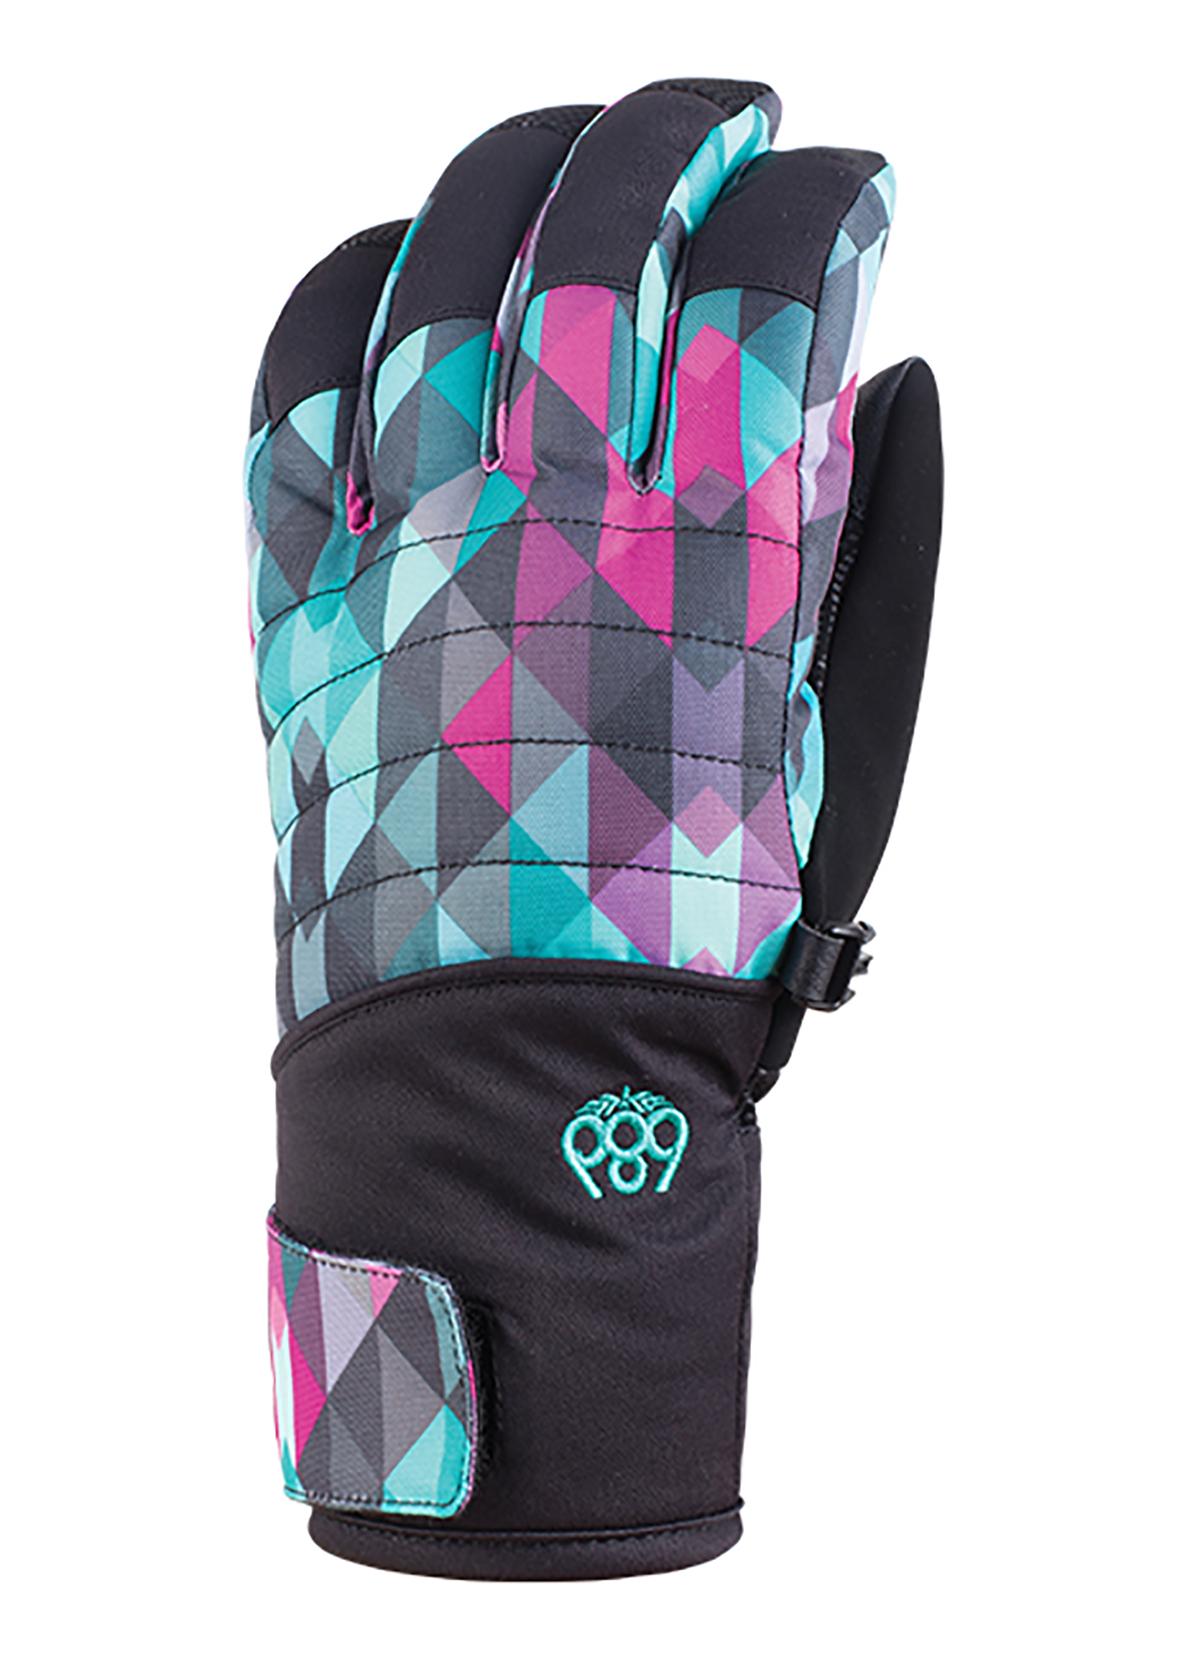 686 Womens Majesty Infiloft Gloves